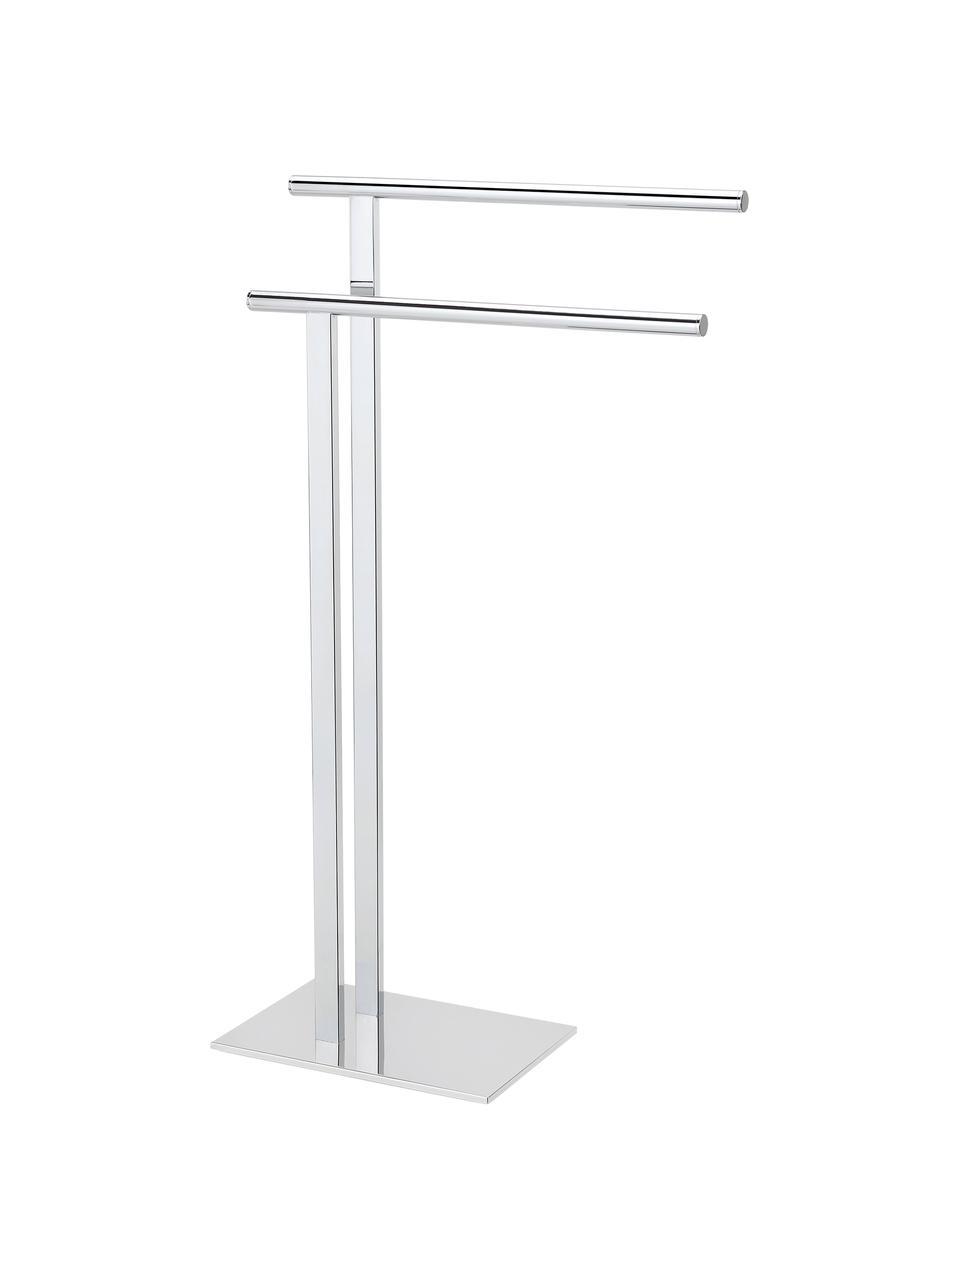 Handtuchhalter Blendon, Metall, Metall, 30 x 83 cm